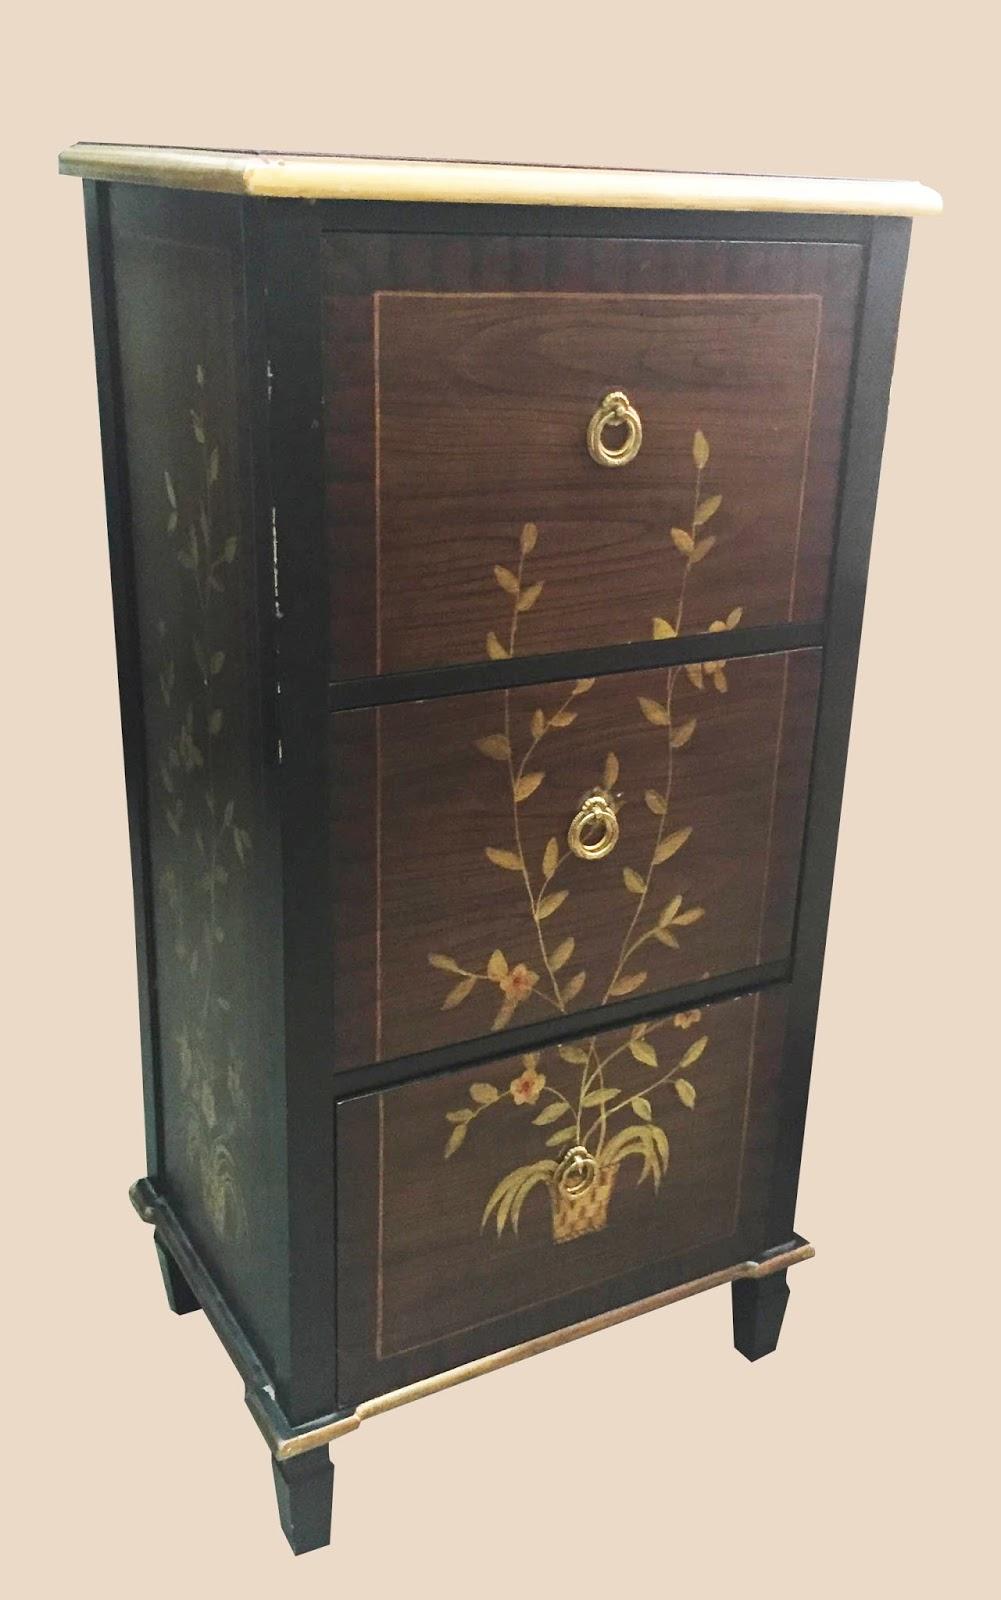 Uhuru Furniture Amp Collectibles Decorative 3 Drawer File